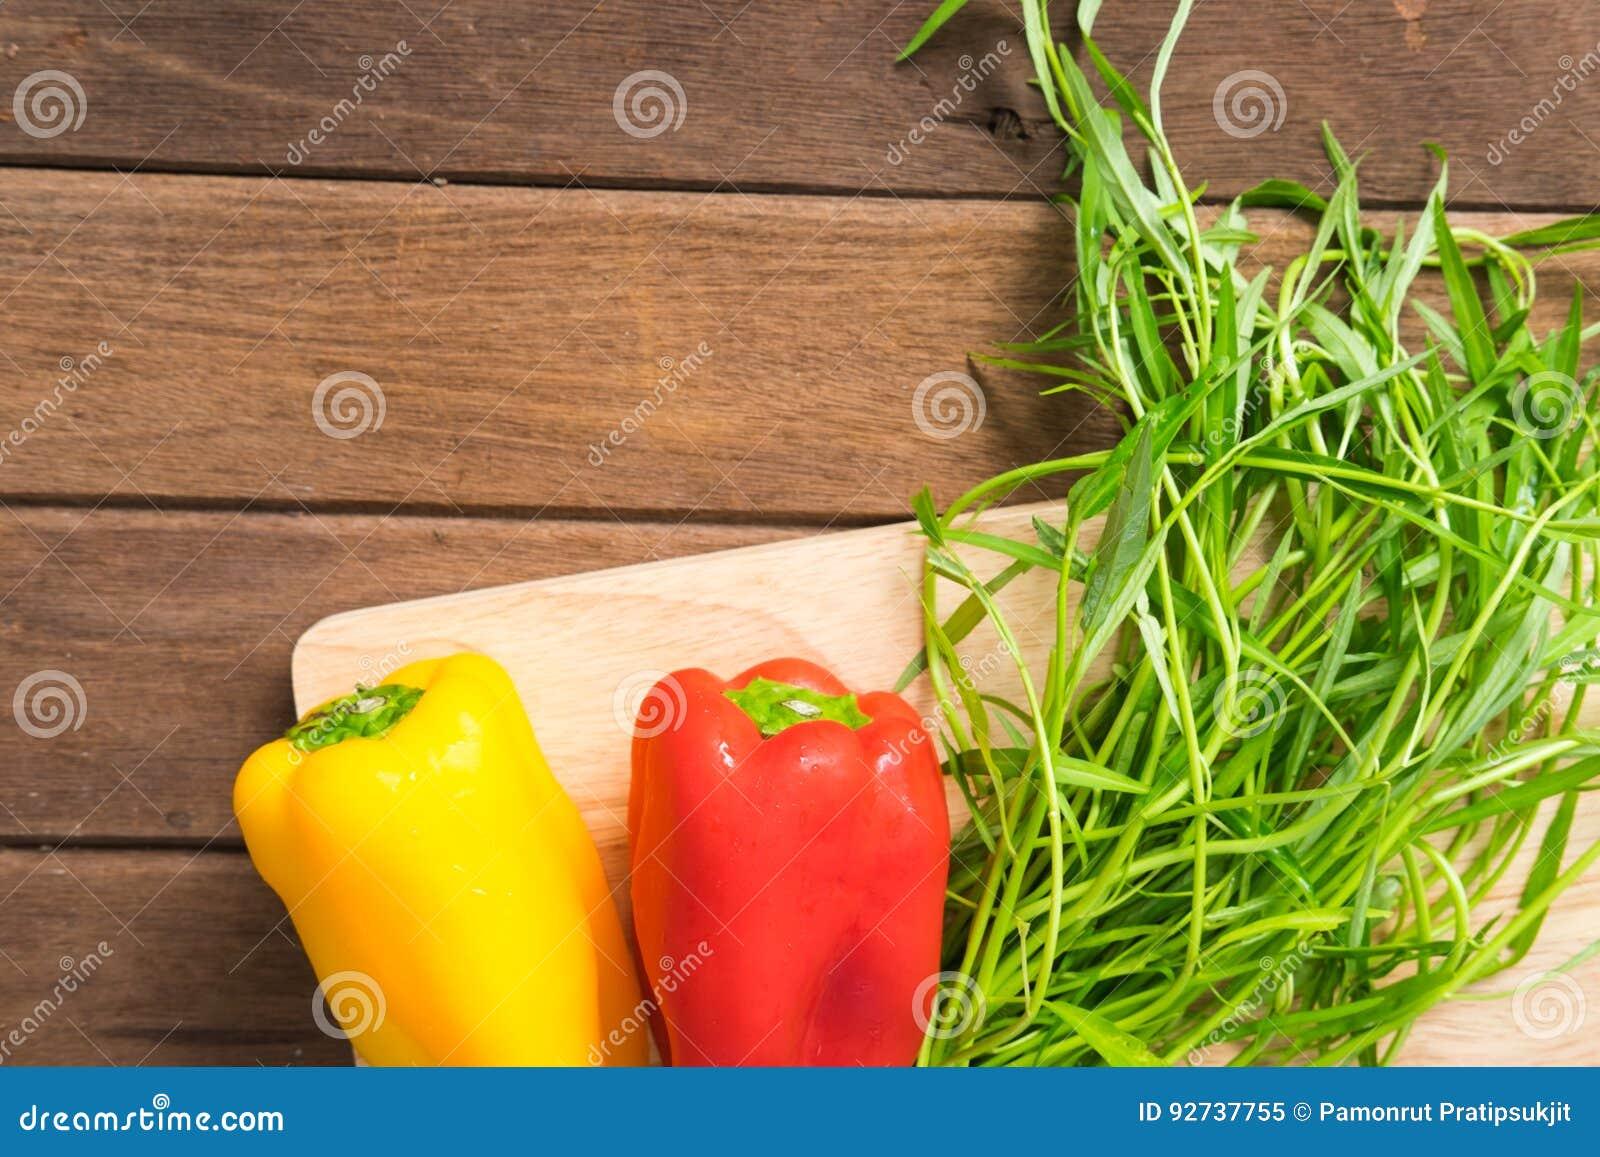 Verse organische groenten op houten achtergrond